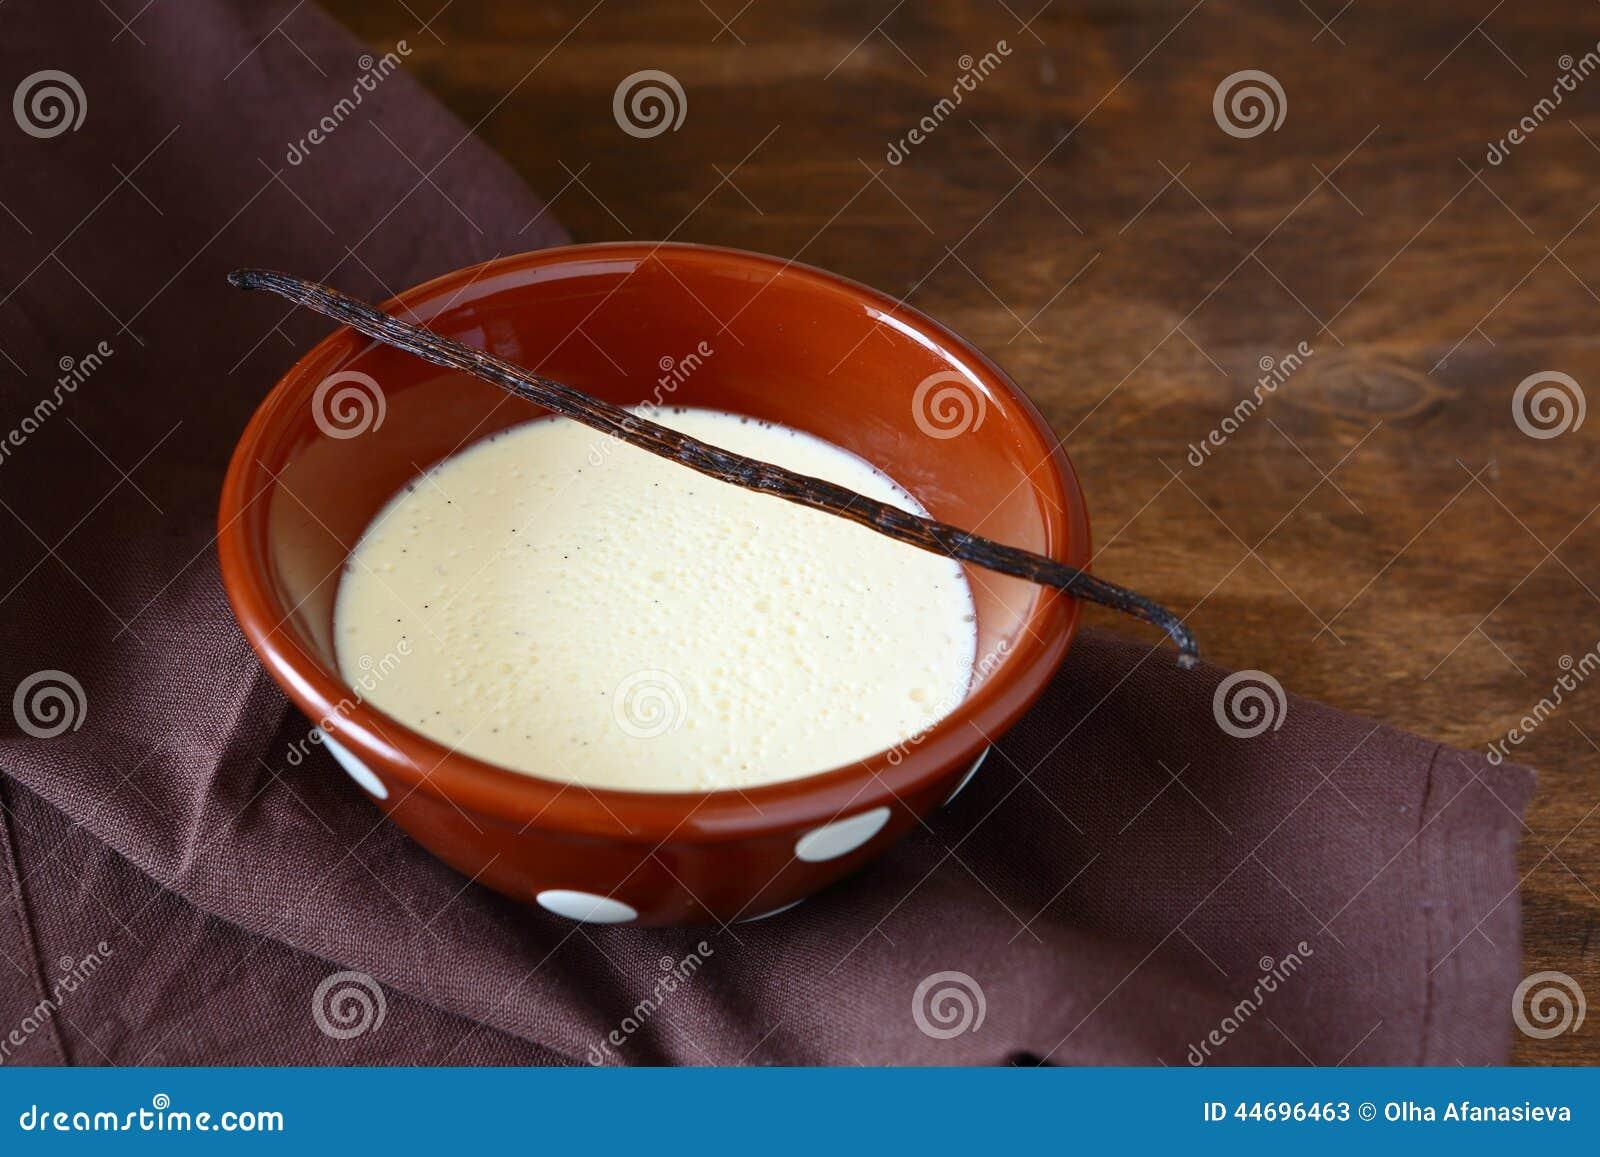 Sweet Cream With Vanilla Stock Photo - Image: 44696463